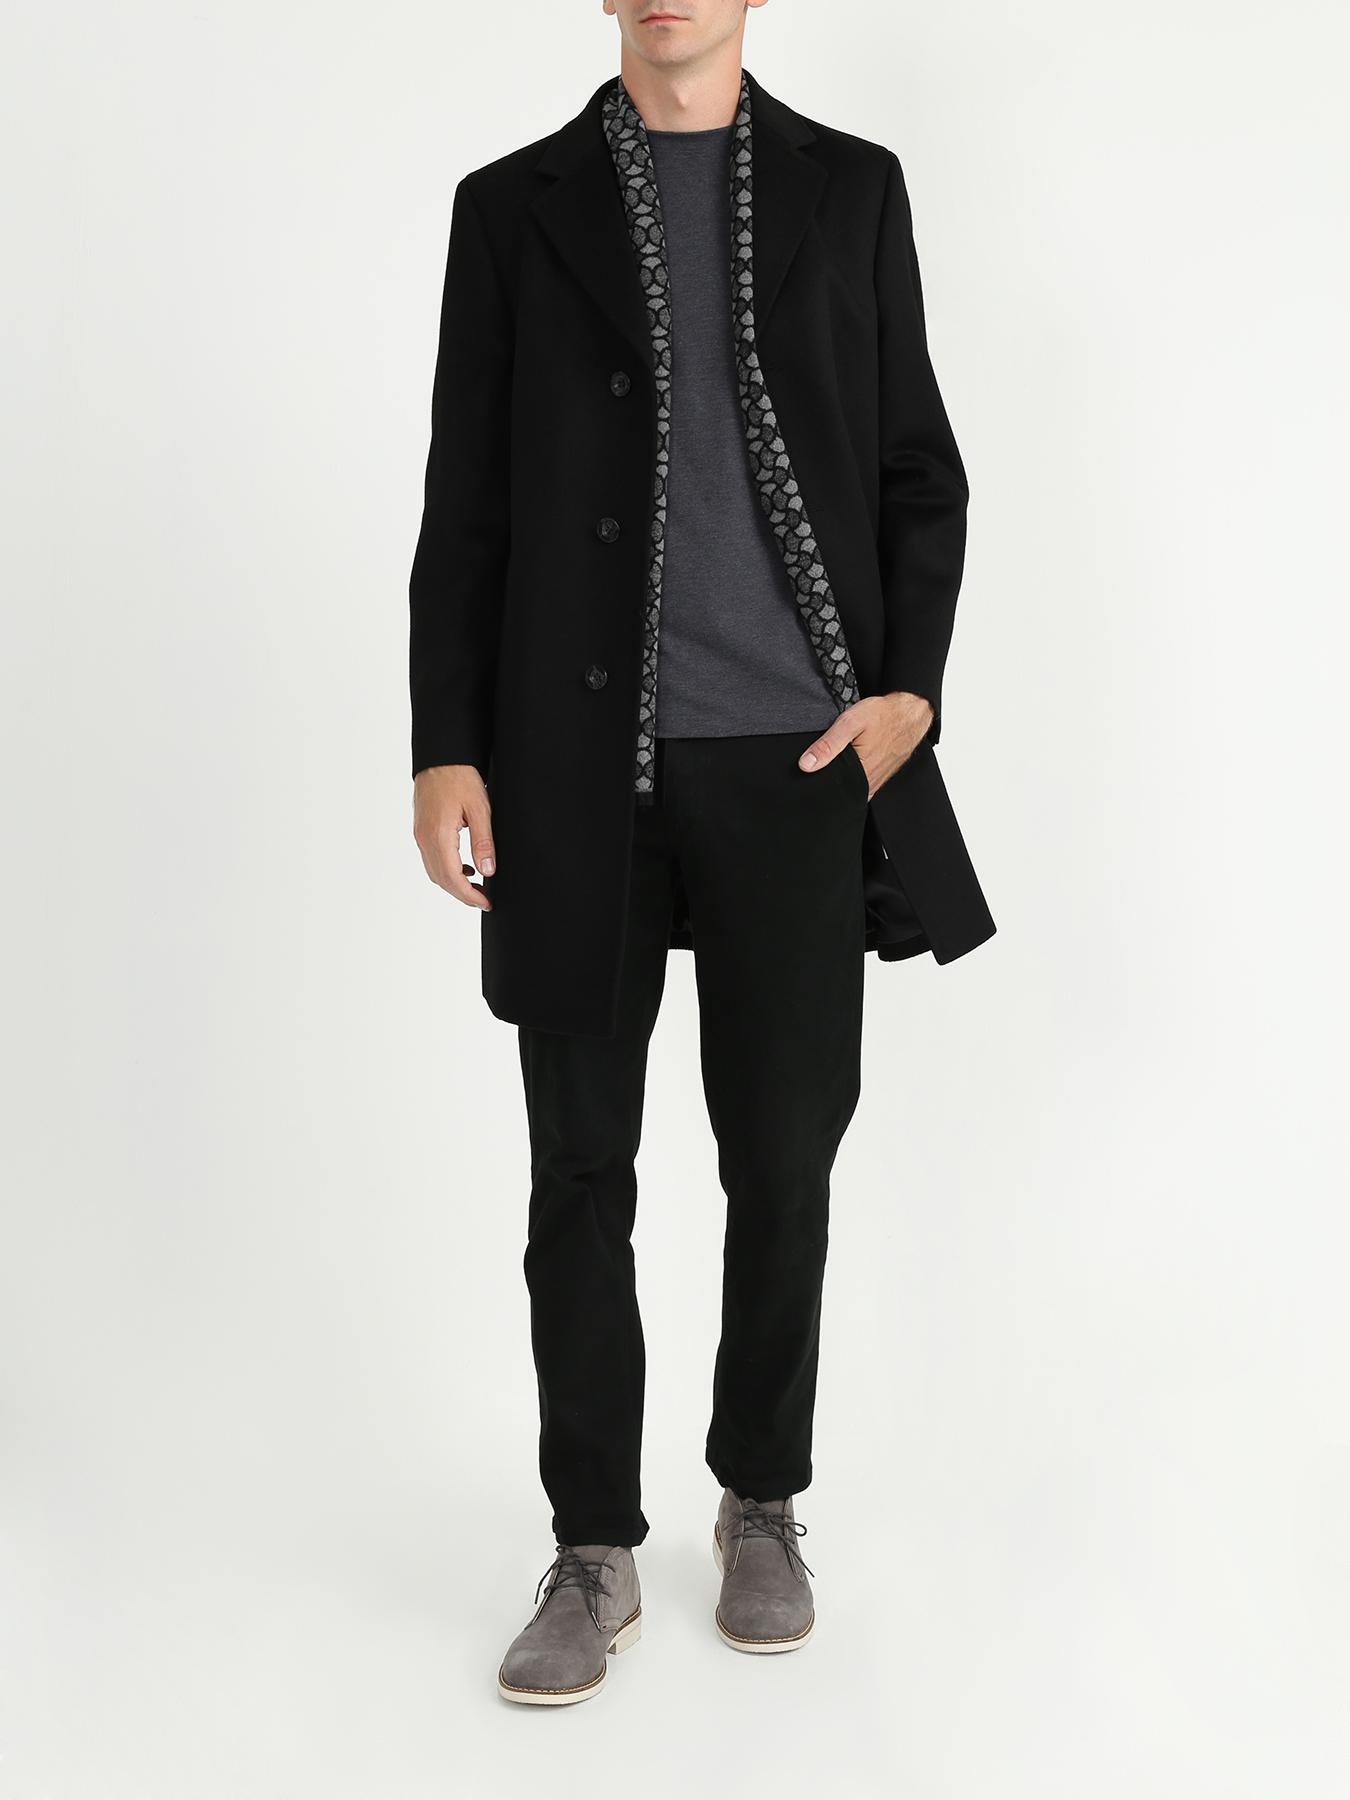 Alessandro Manzoni Классическое пальто 313435-026